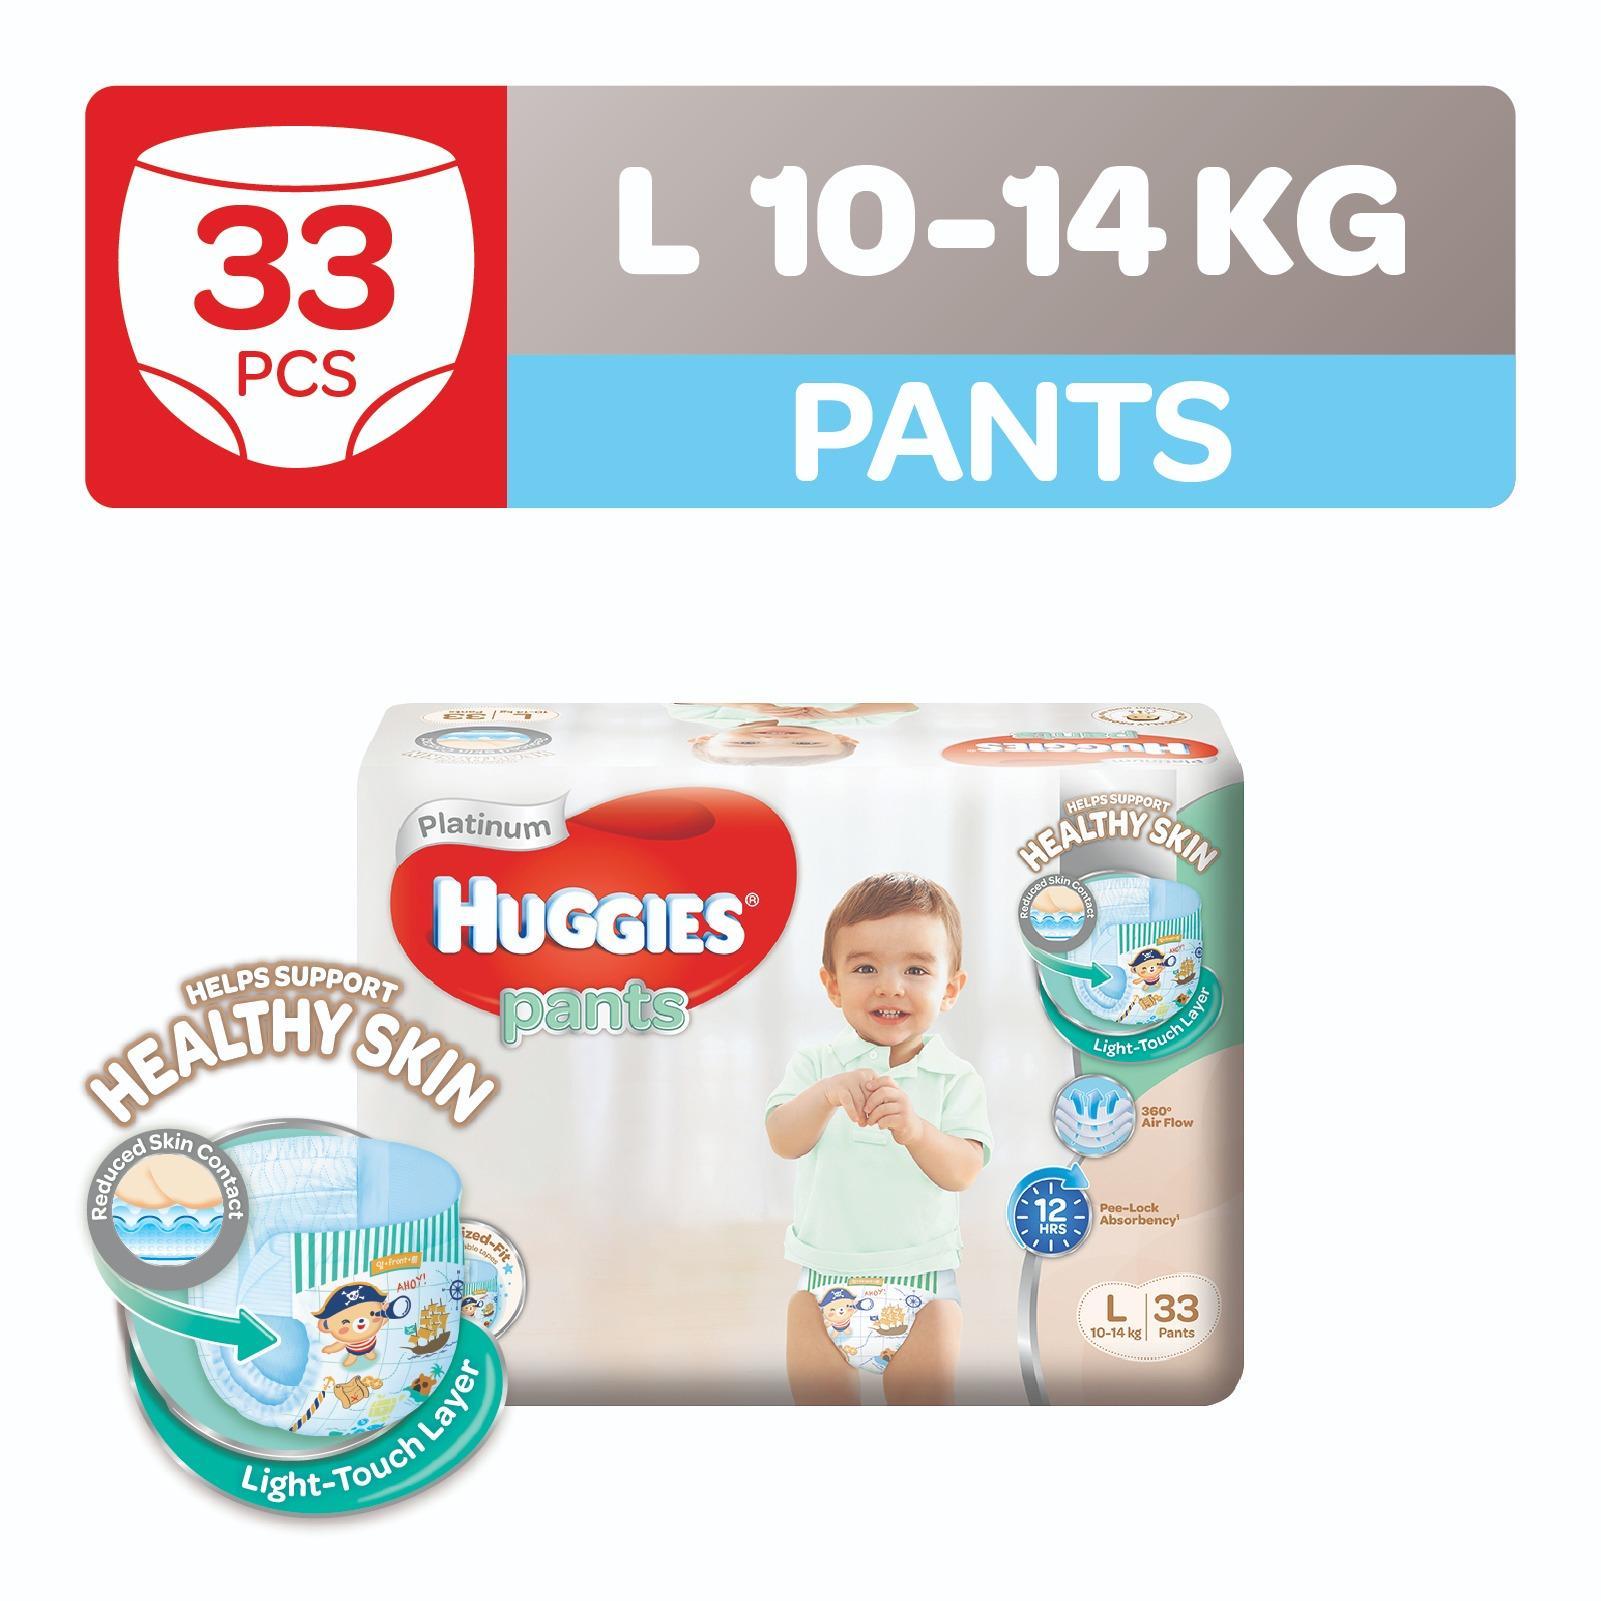 Bargain Huggies Silver Pants M 64pcs Singapore Pricelist Baby Mamypoko Tape Small Packet Platinum L 33pcs